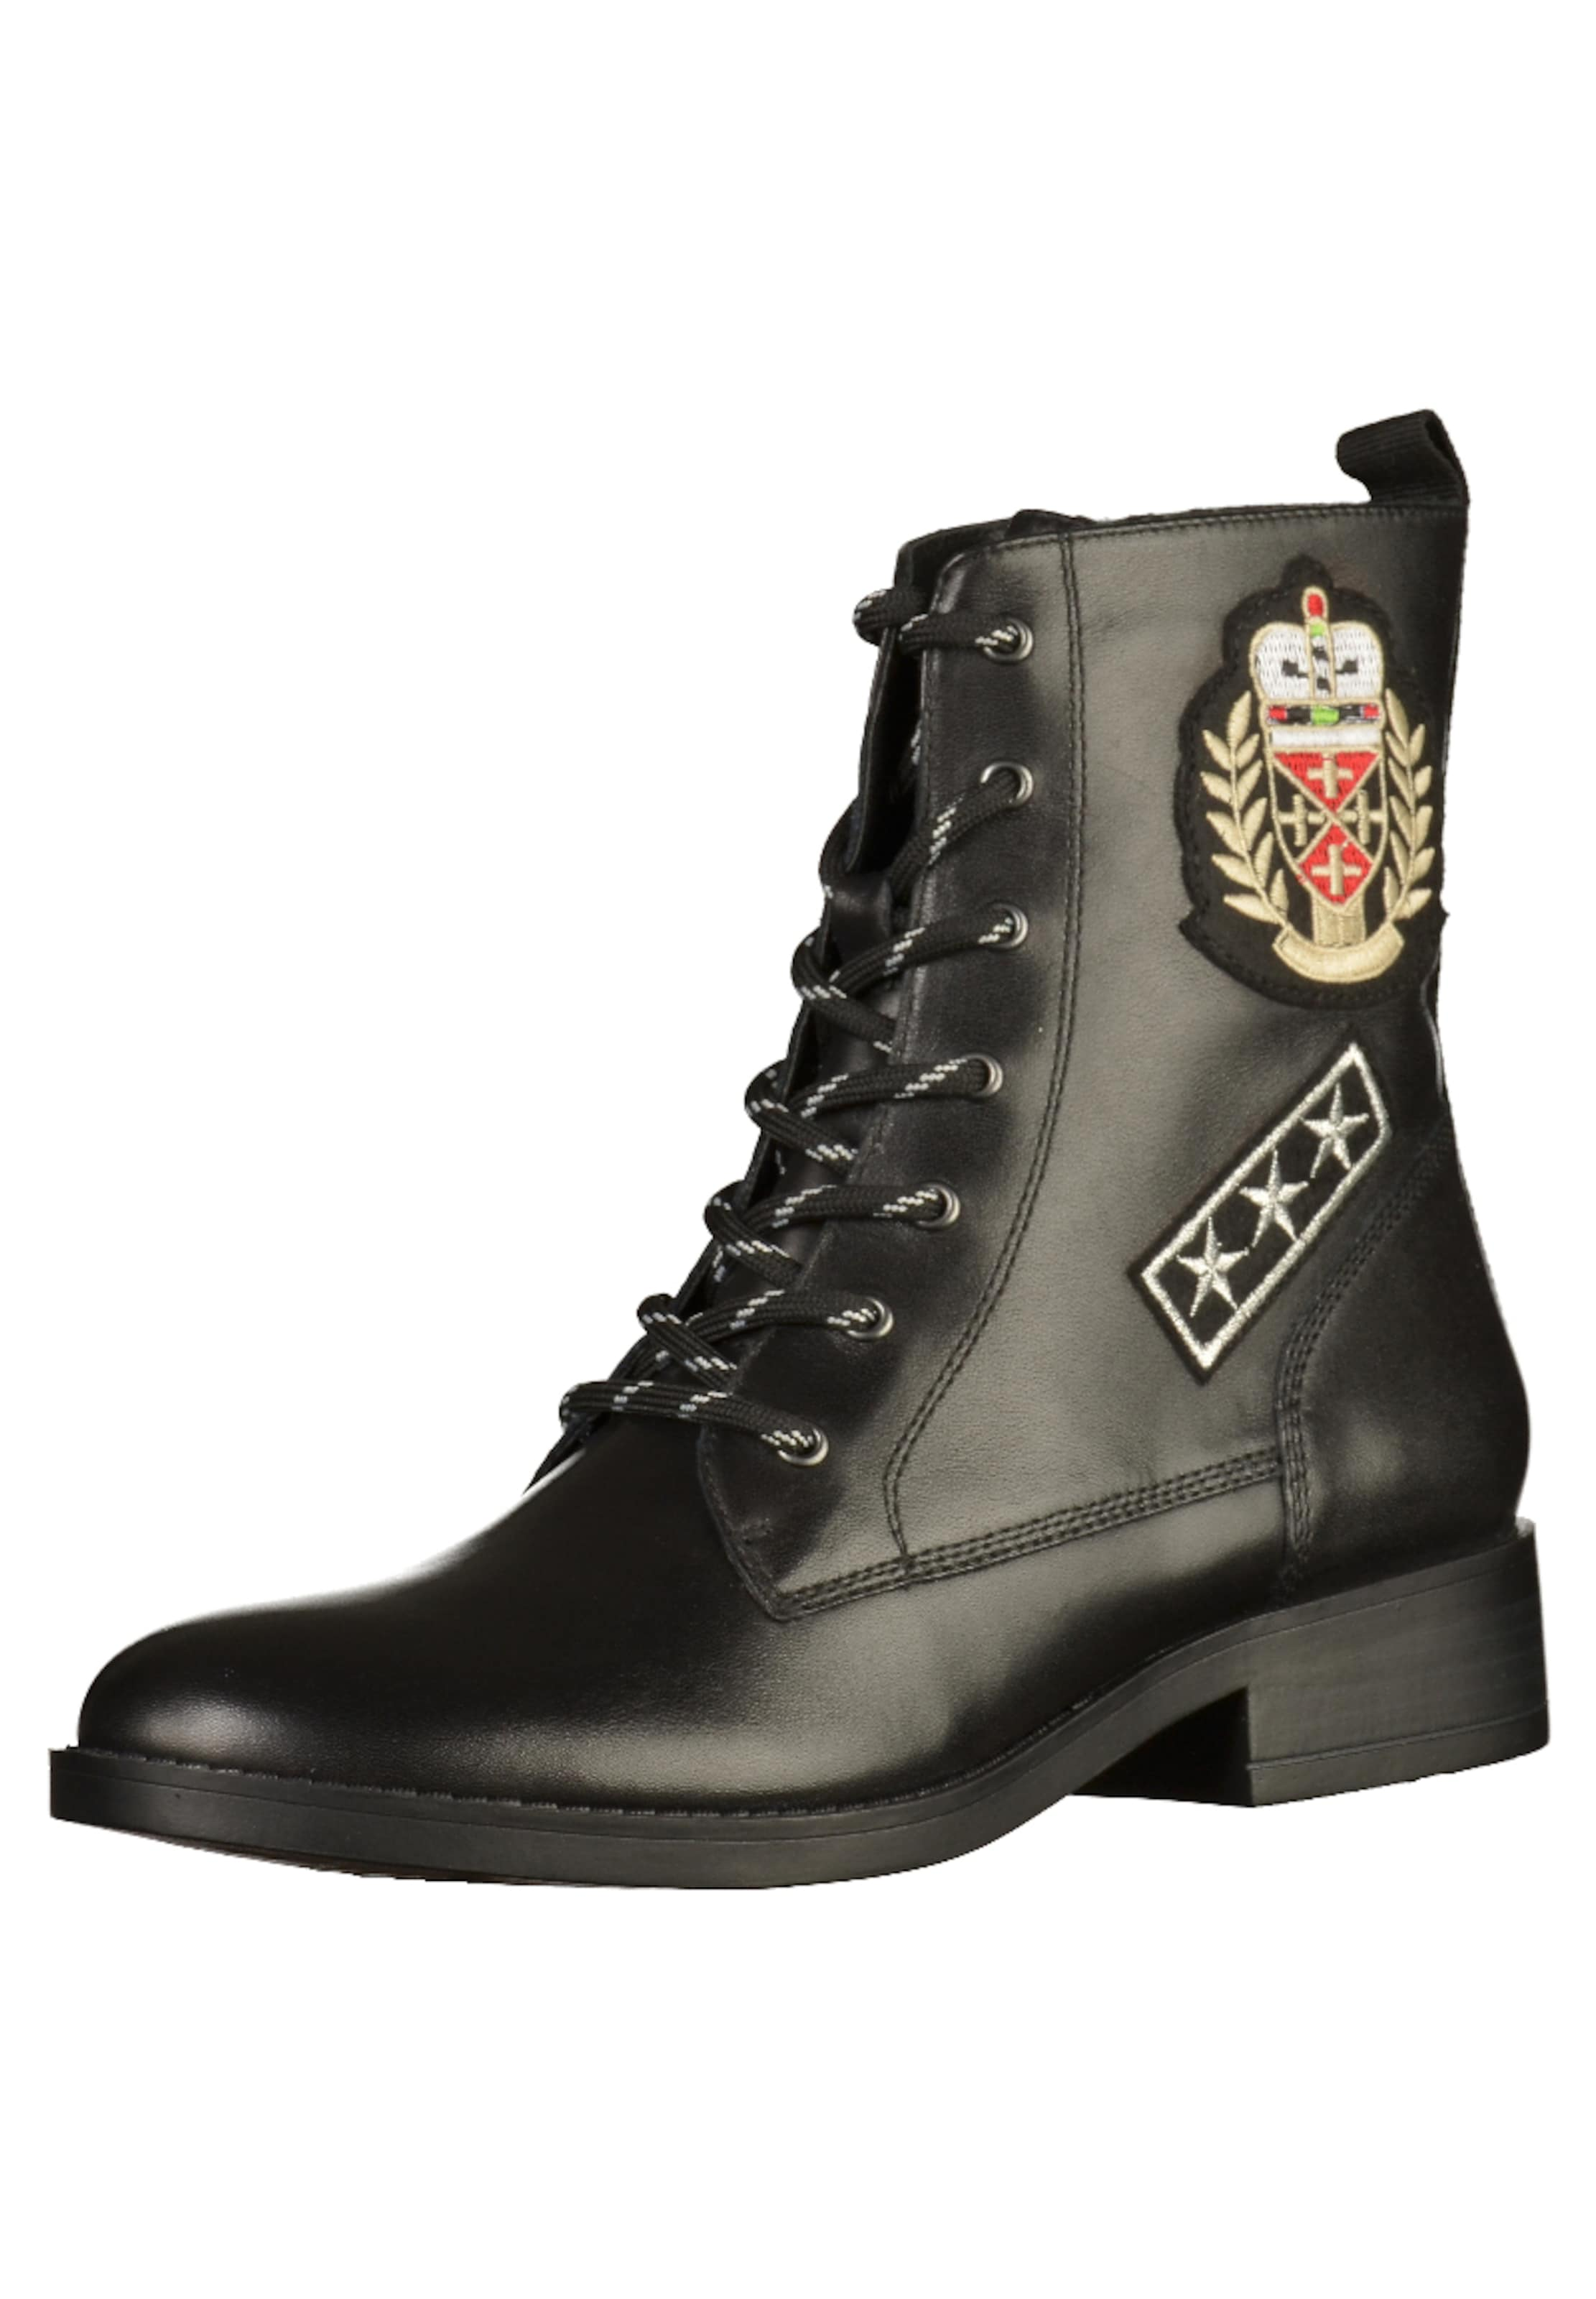 Haltbare Mode Schuhe billige Schuhe SPM | Stiefelette Schuhe Mode Gut getragene Schuhe 136458